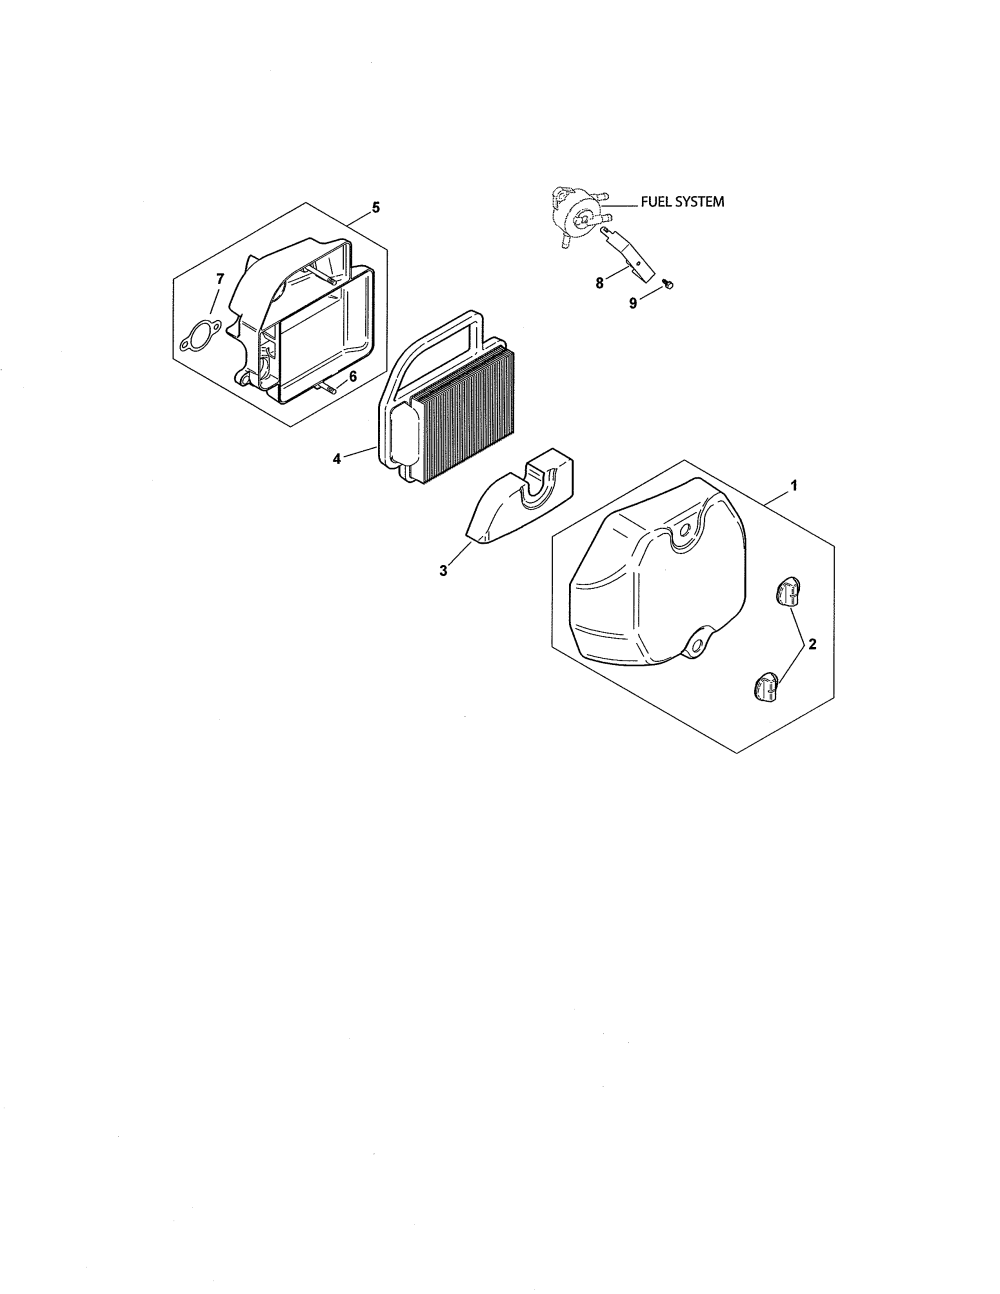 medium resolution of kohler sv590 0220 air intake filtration diagram